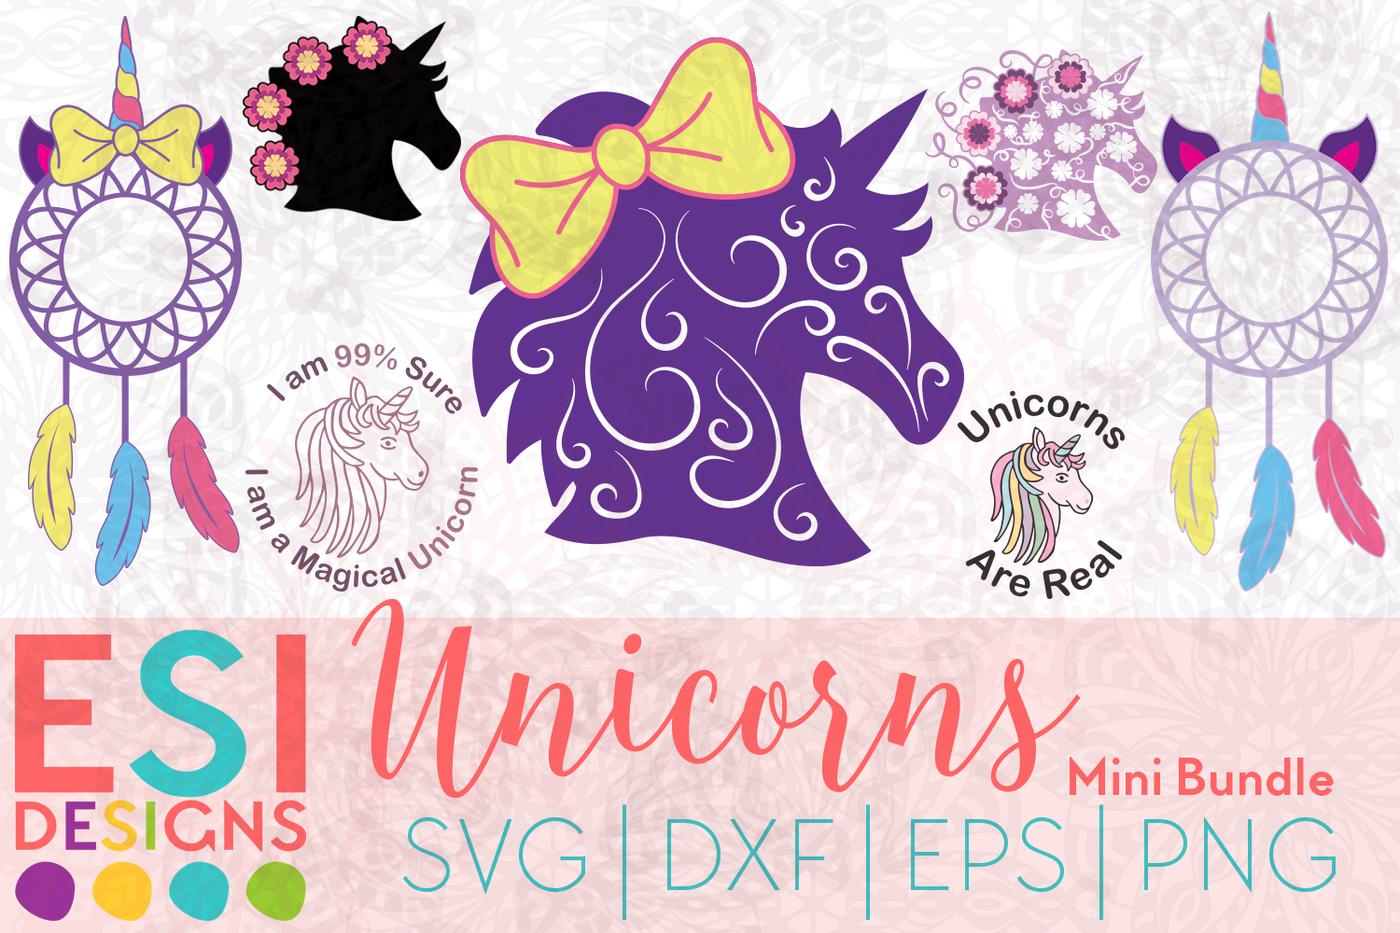 Unicorns Mini Bundle Svg Dxf Eps Png Cut Files By Esi